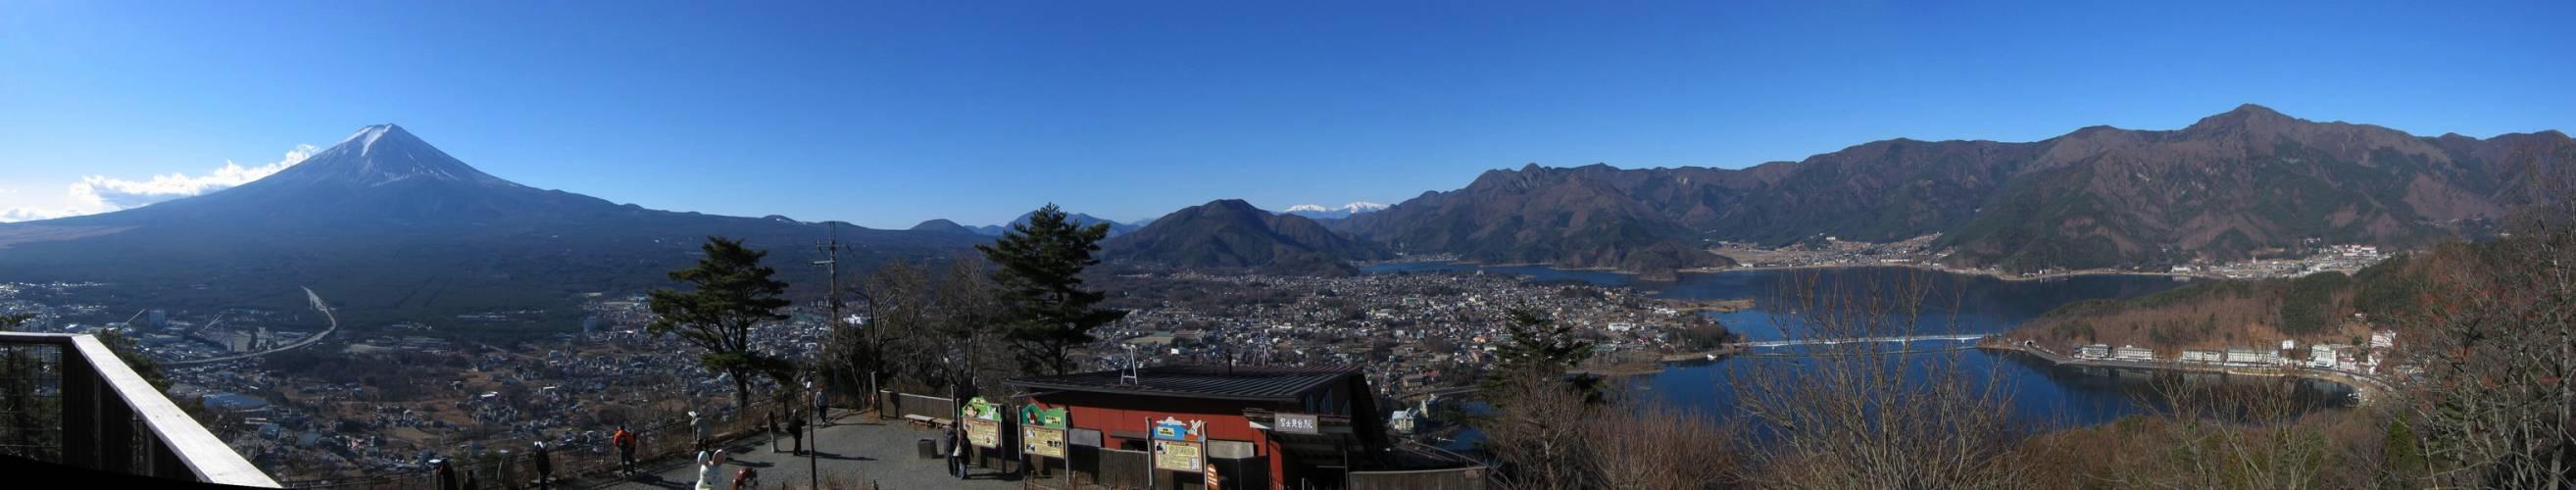 Fuji-san und der Kawaguchi See